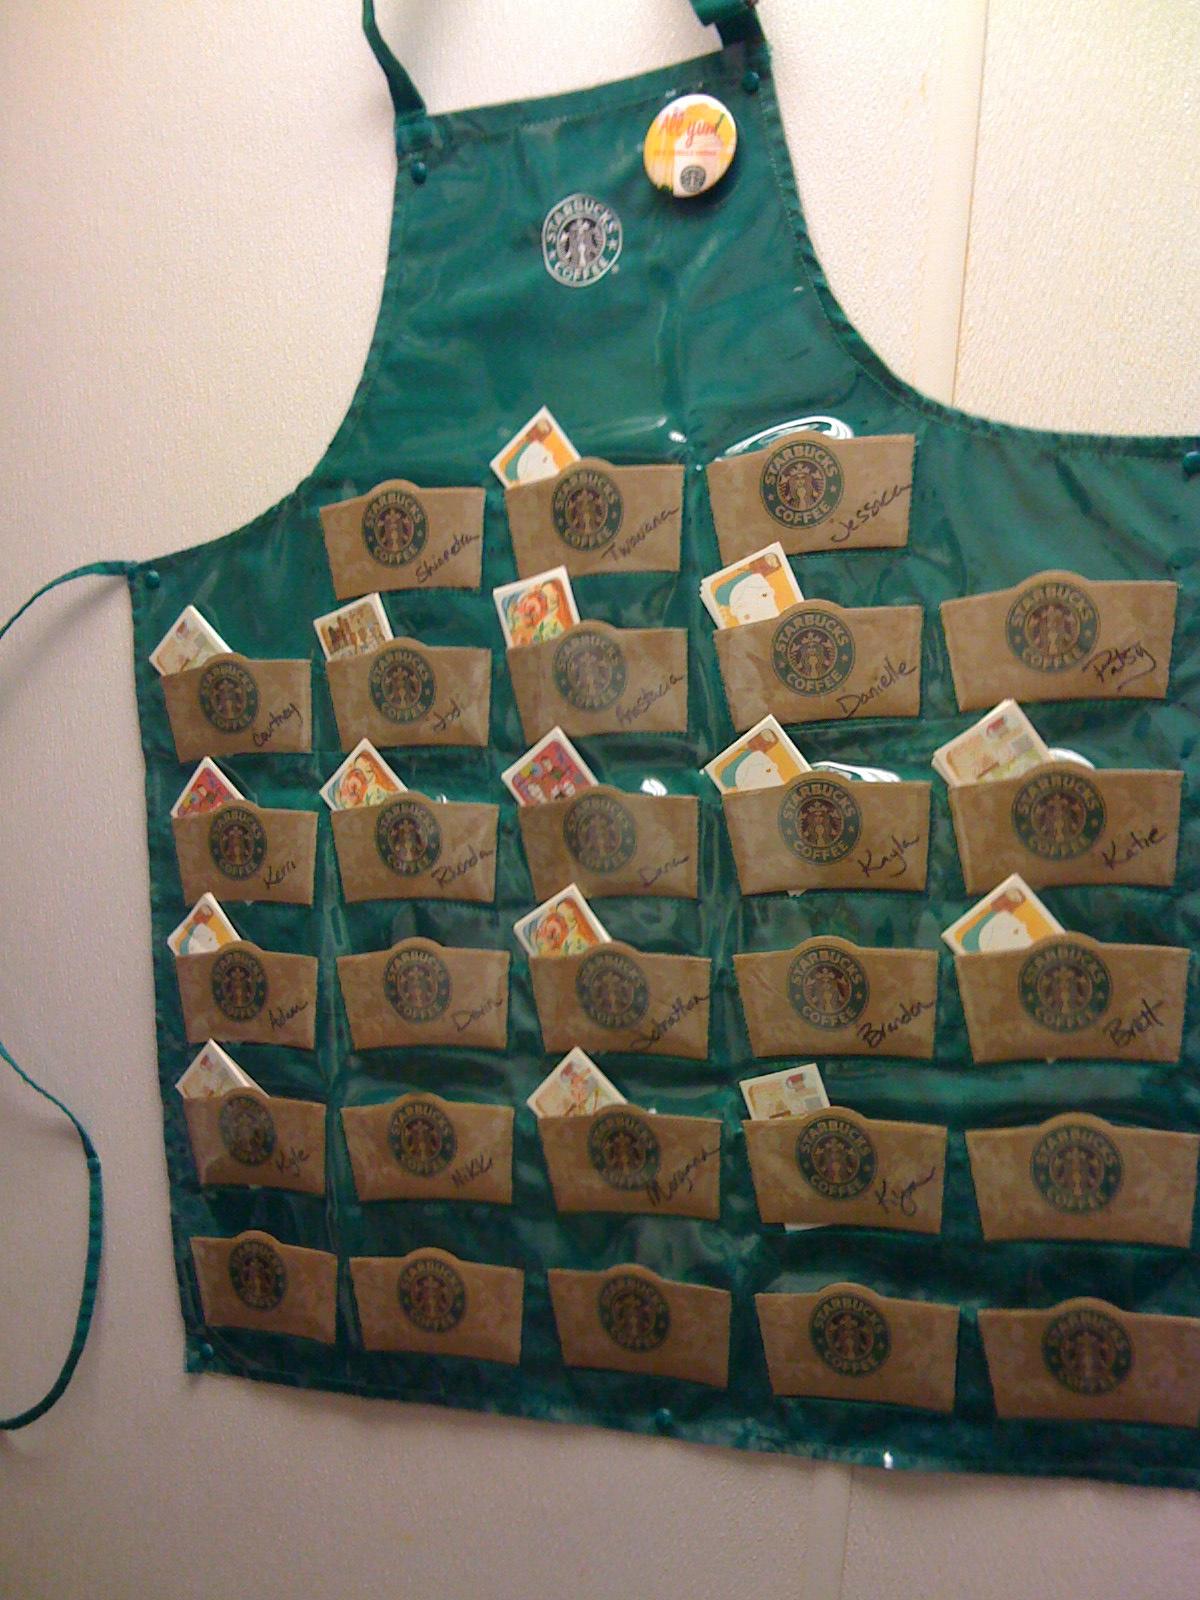 the green apron blah blah blog rh starbucksgirl wordpress com Green Apron Board Ideas Green Apron Board Ideas